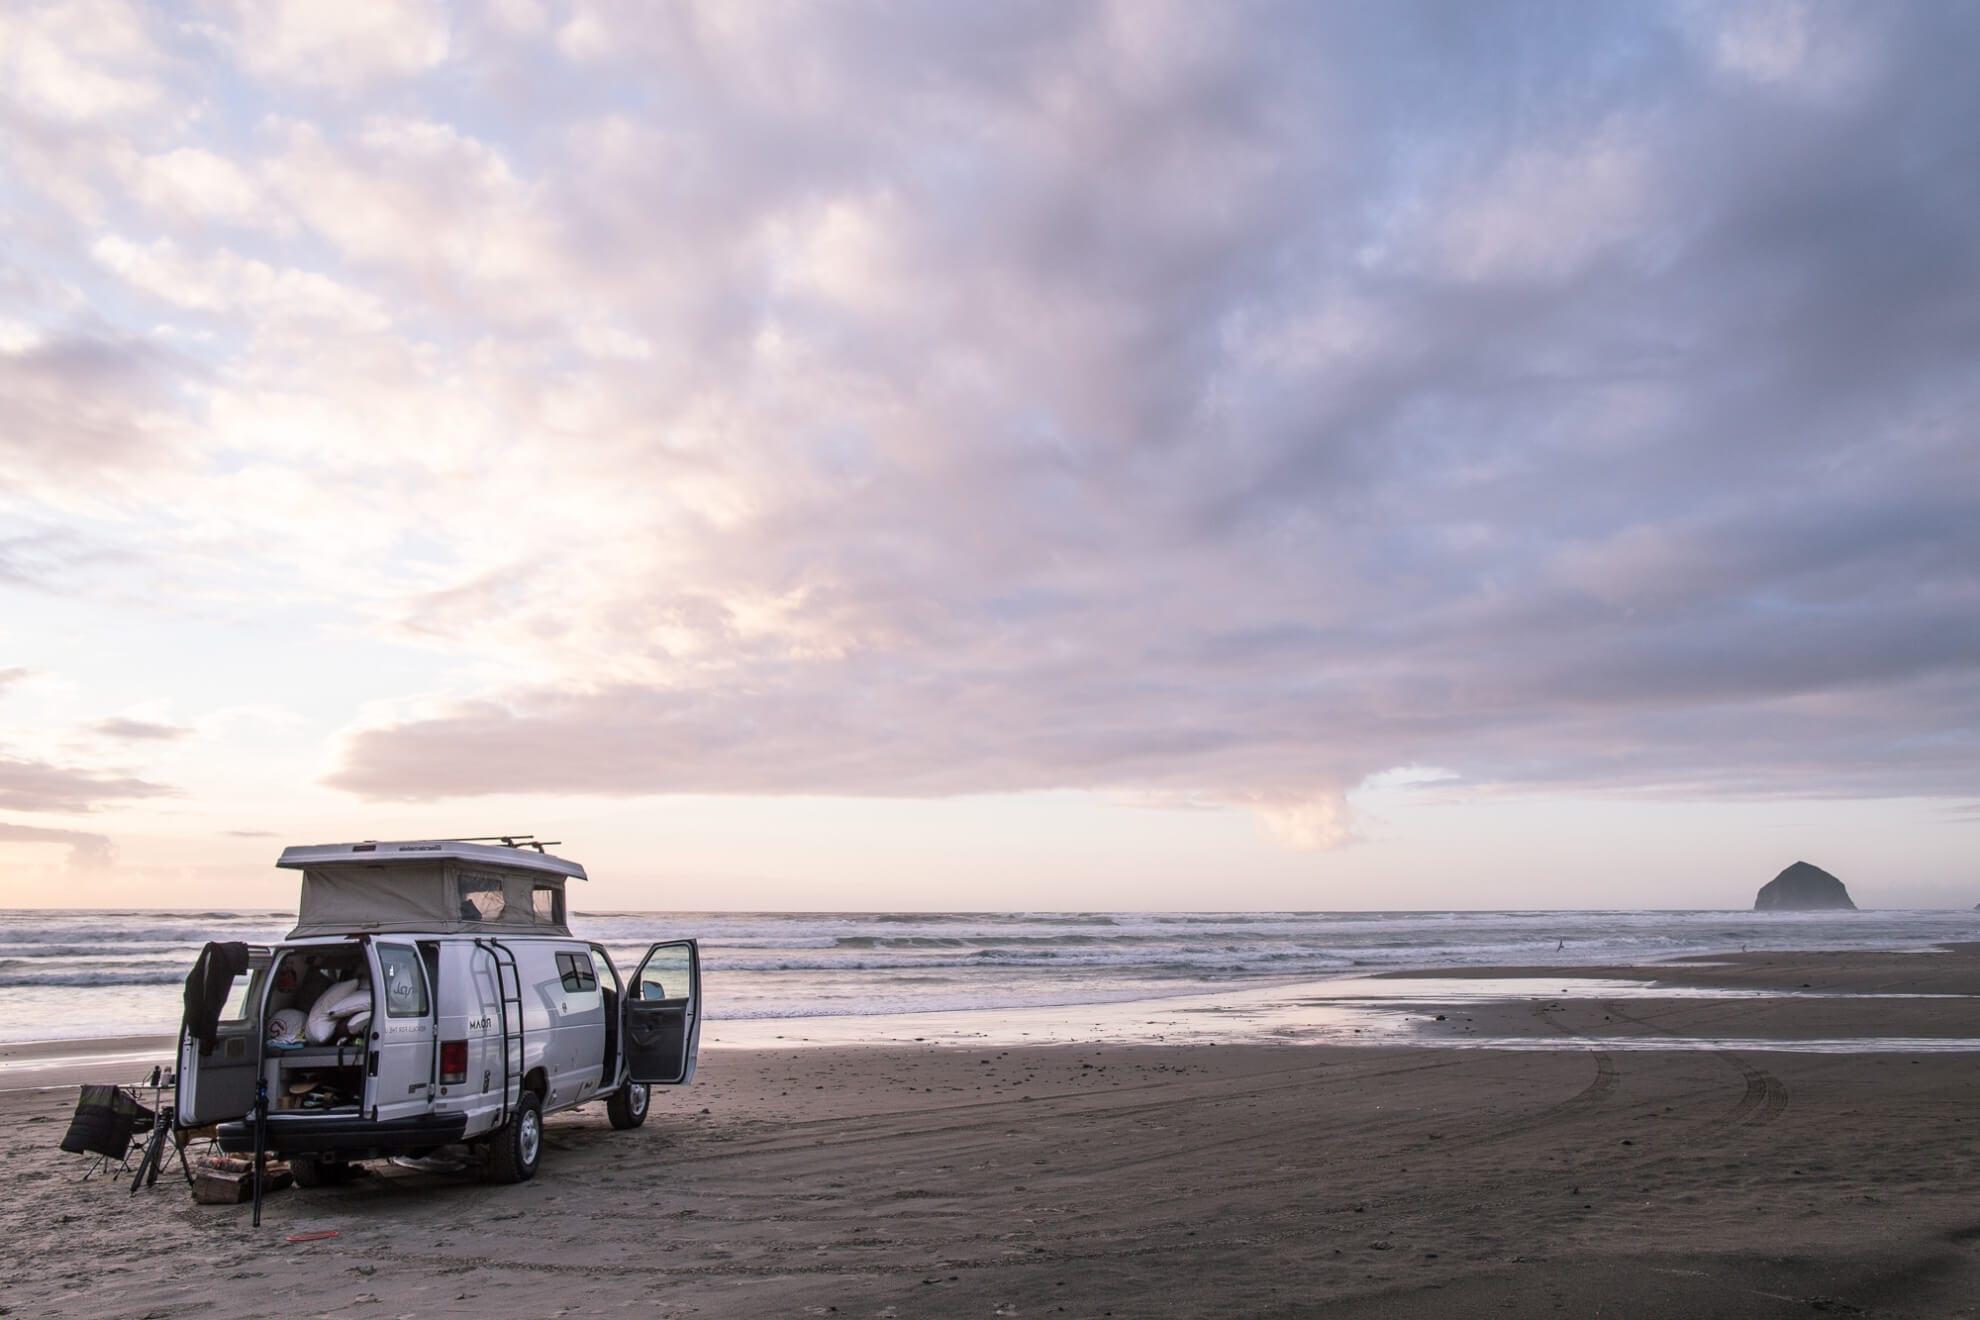 Camping on Oregon Coast - ROAMERICA